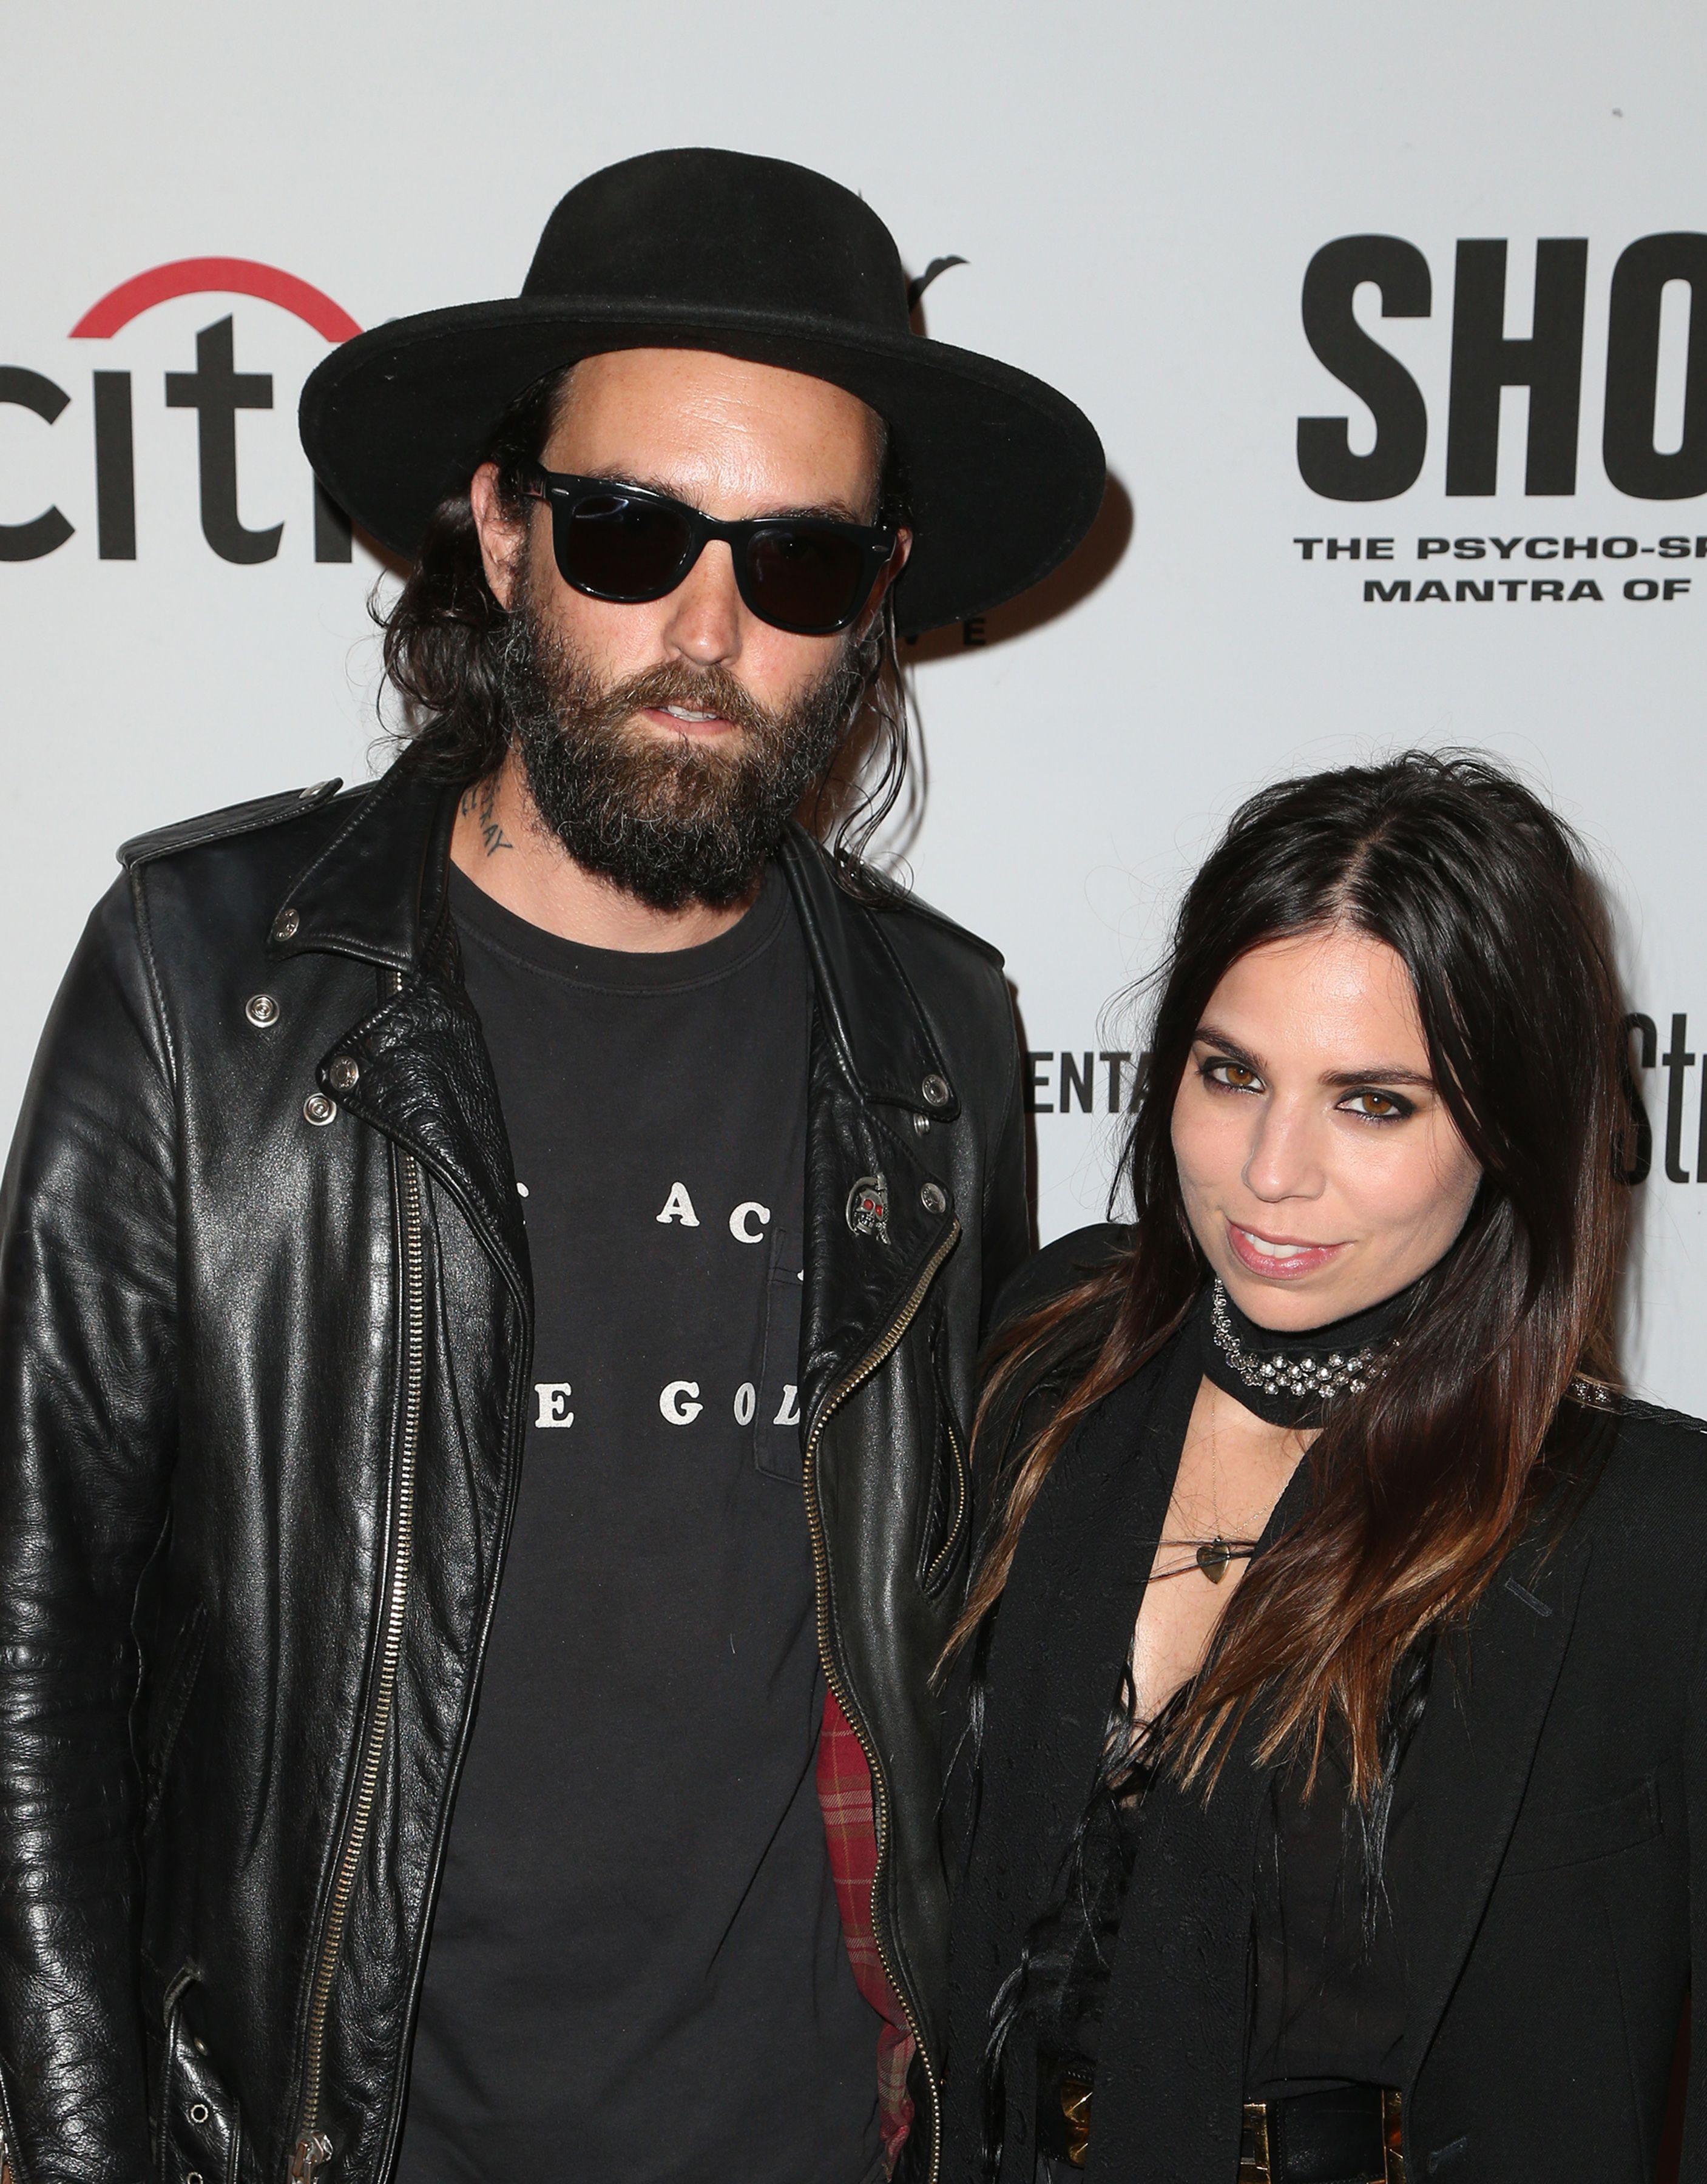 Steve Hash, Ally Hilfiger'SHOT! The Psycho Spiritual Mantra of Rock' film premiere, Los Angeles, USA - 04 Apr 2017